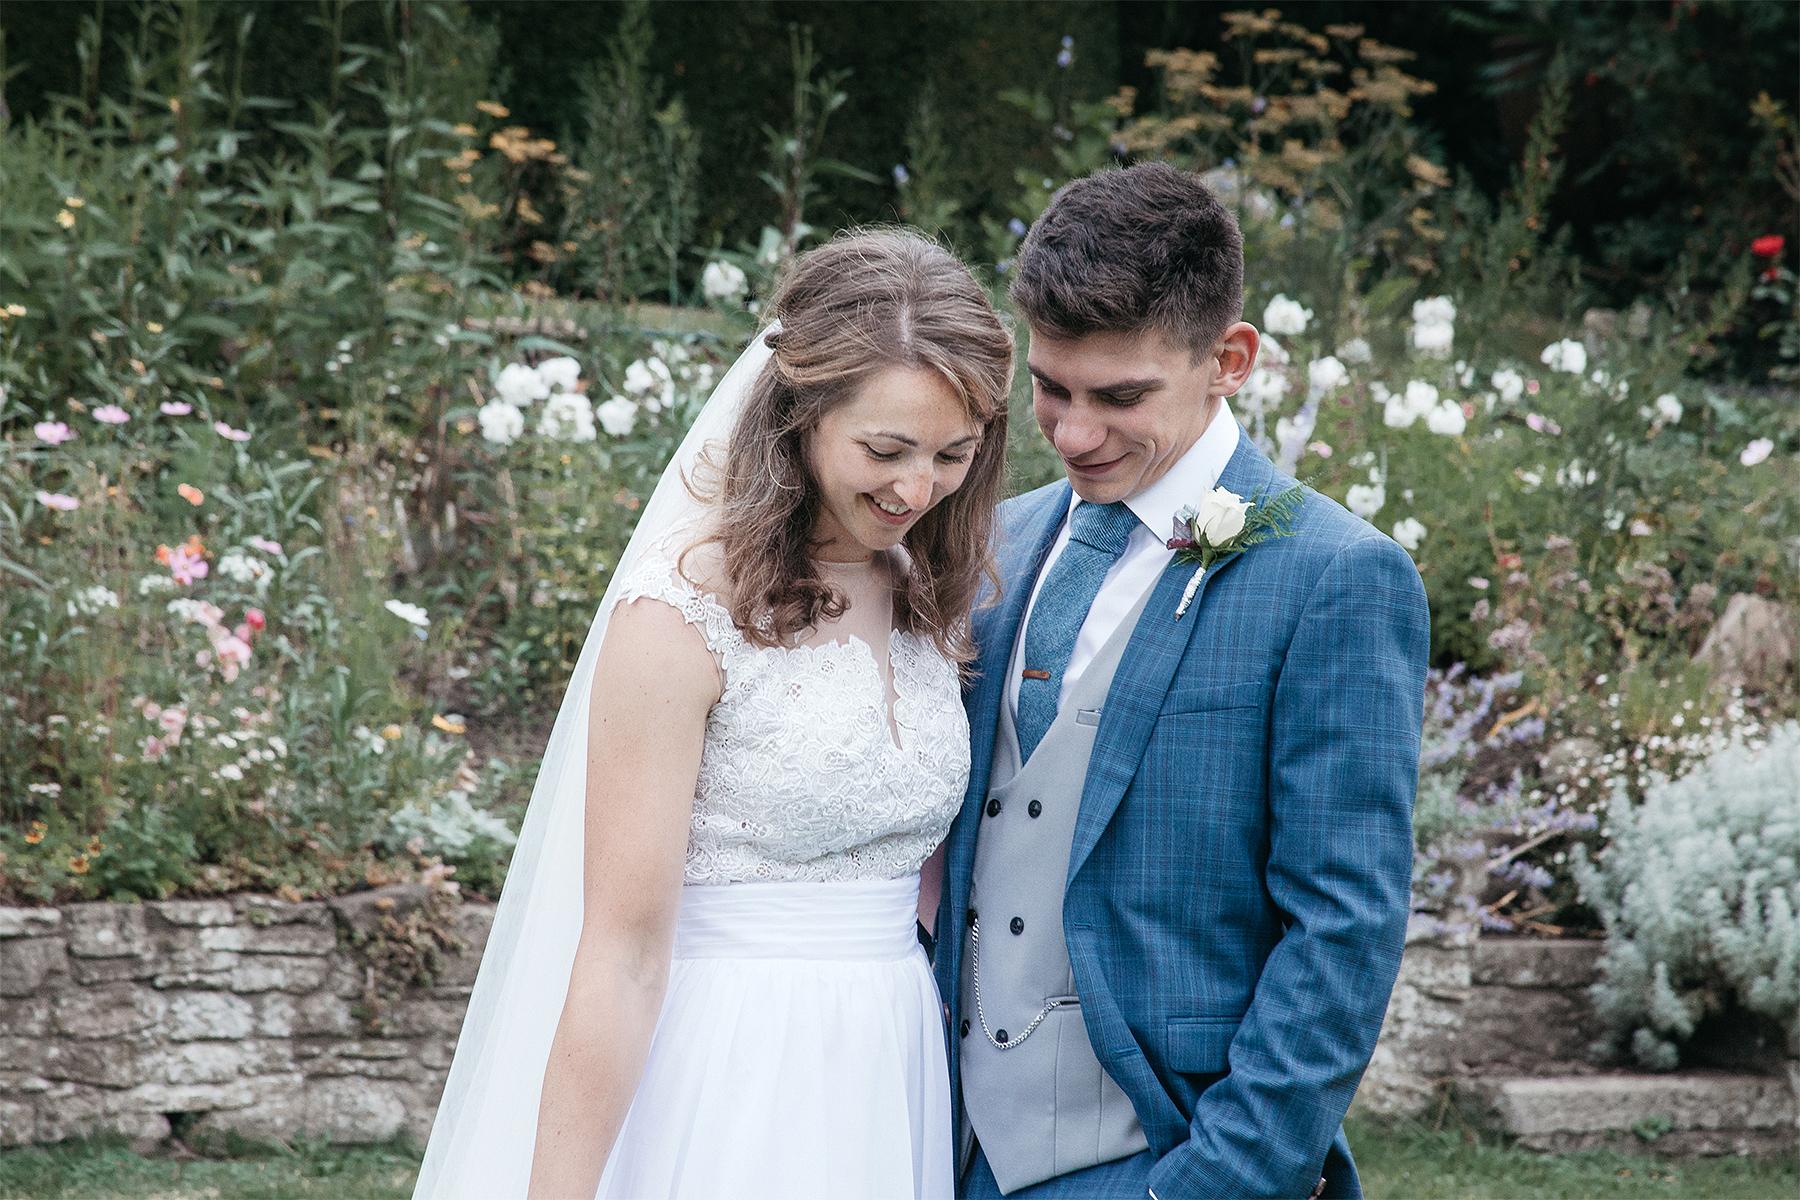 Use Castle Wedding Photography